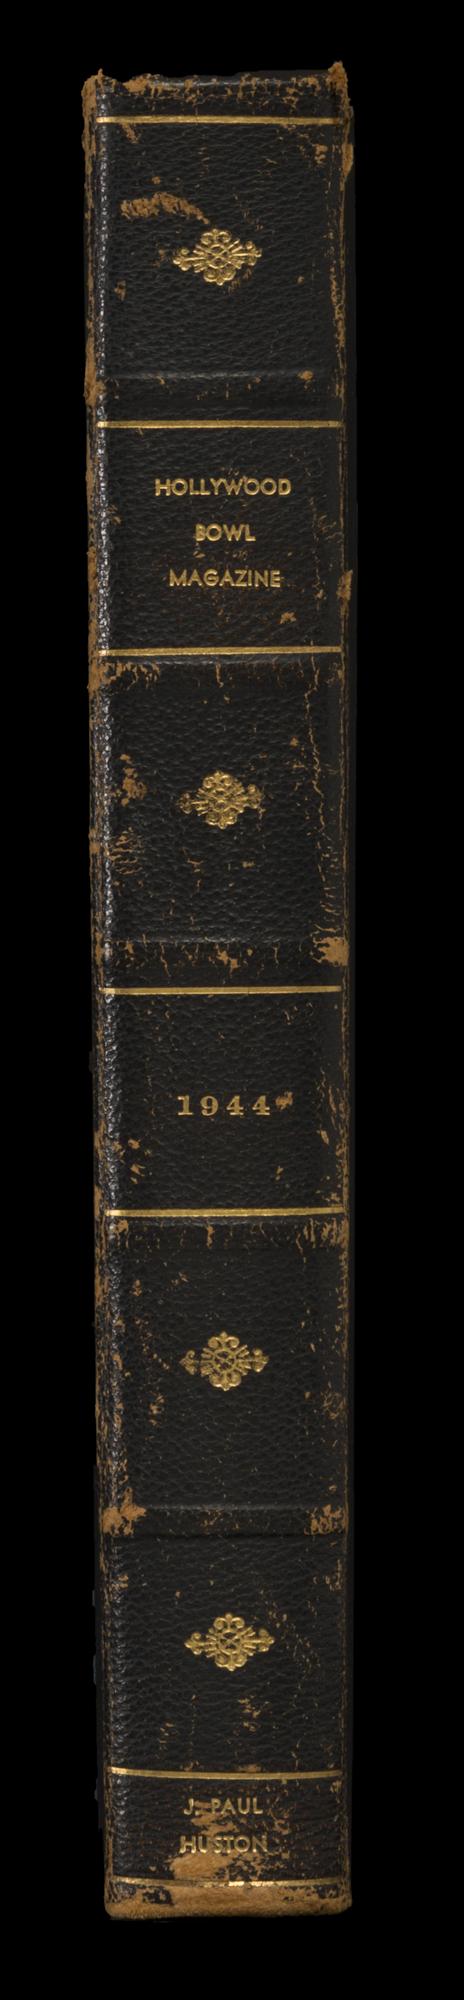 HB_ProgramBook_Spine_1944.jpg